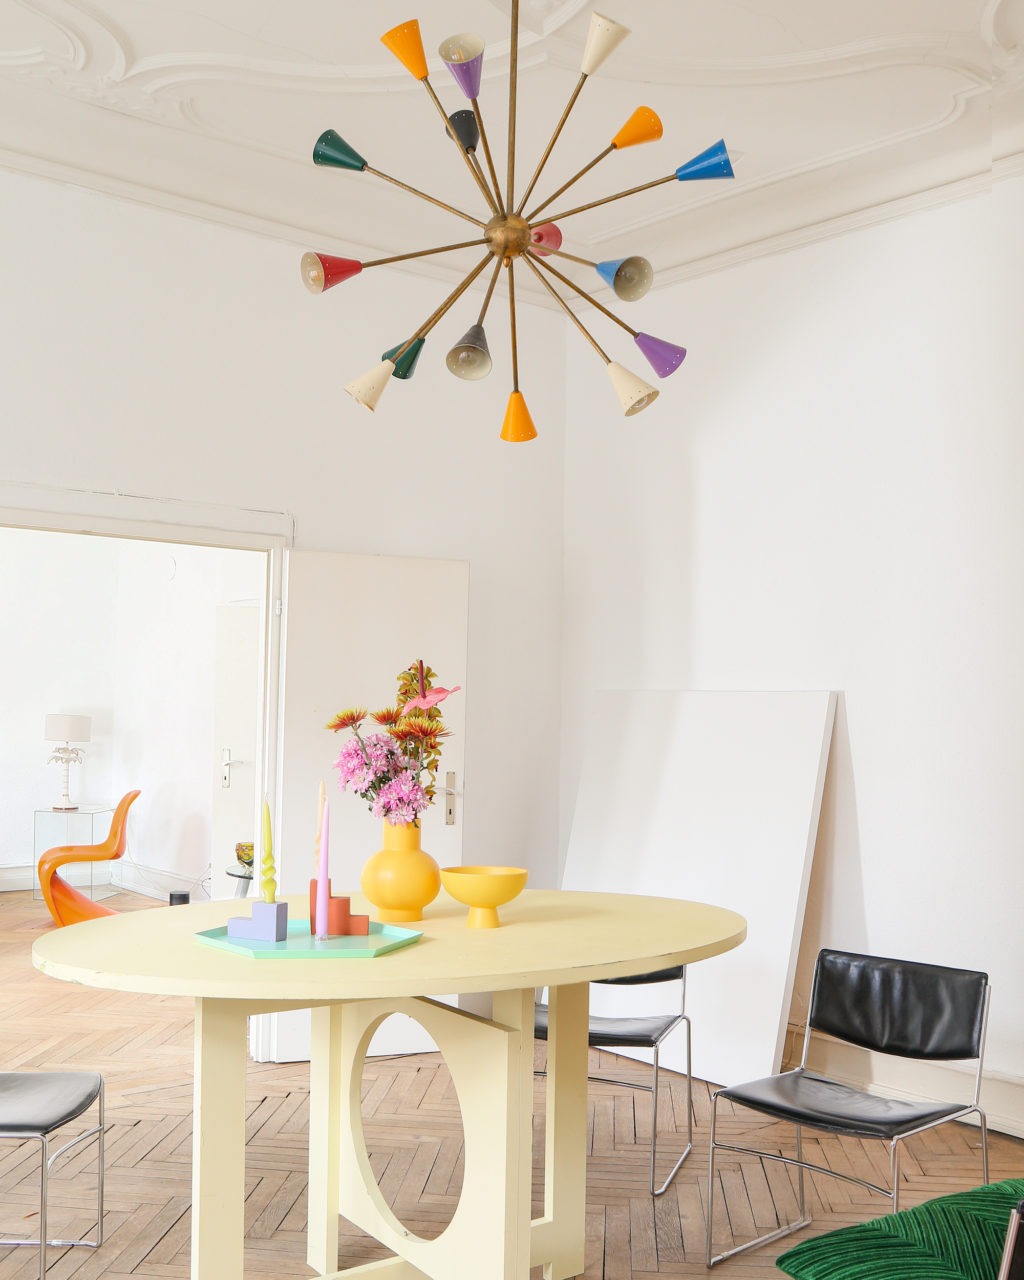 Homestory: Farbenpracht im Altbau bei Tina Mia Weidmann